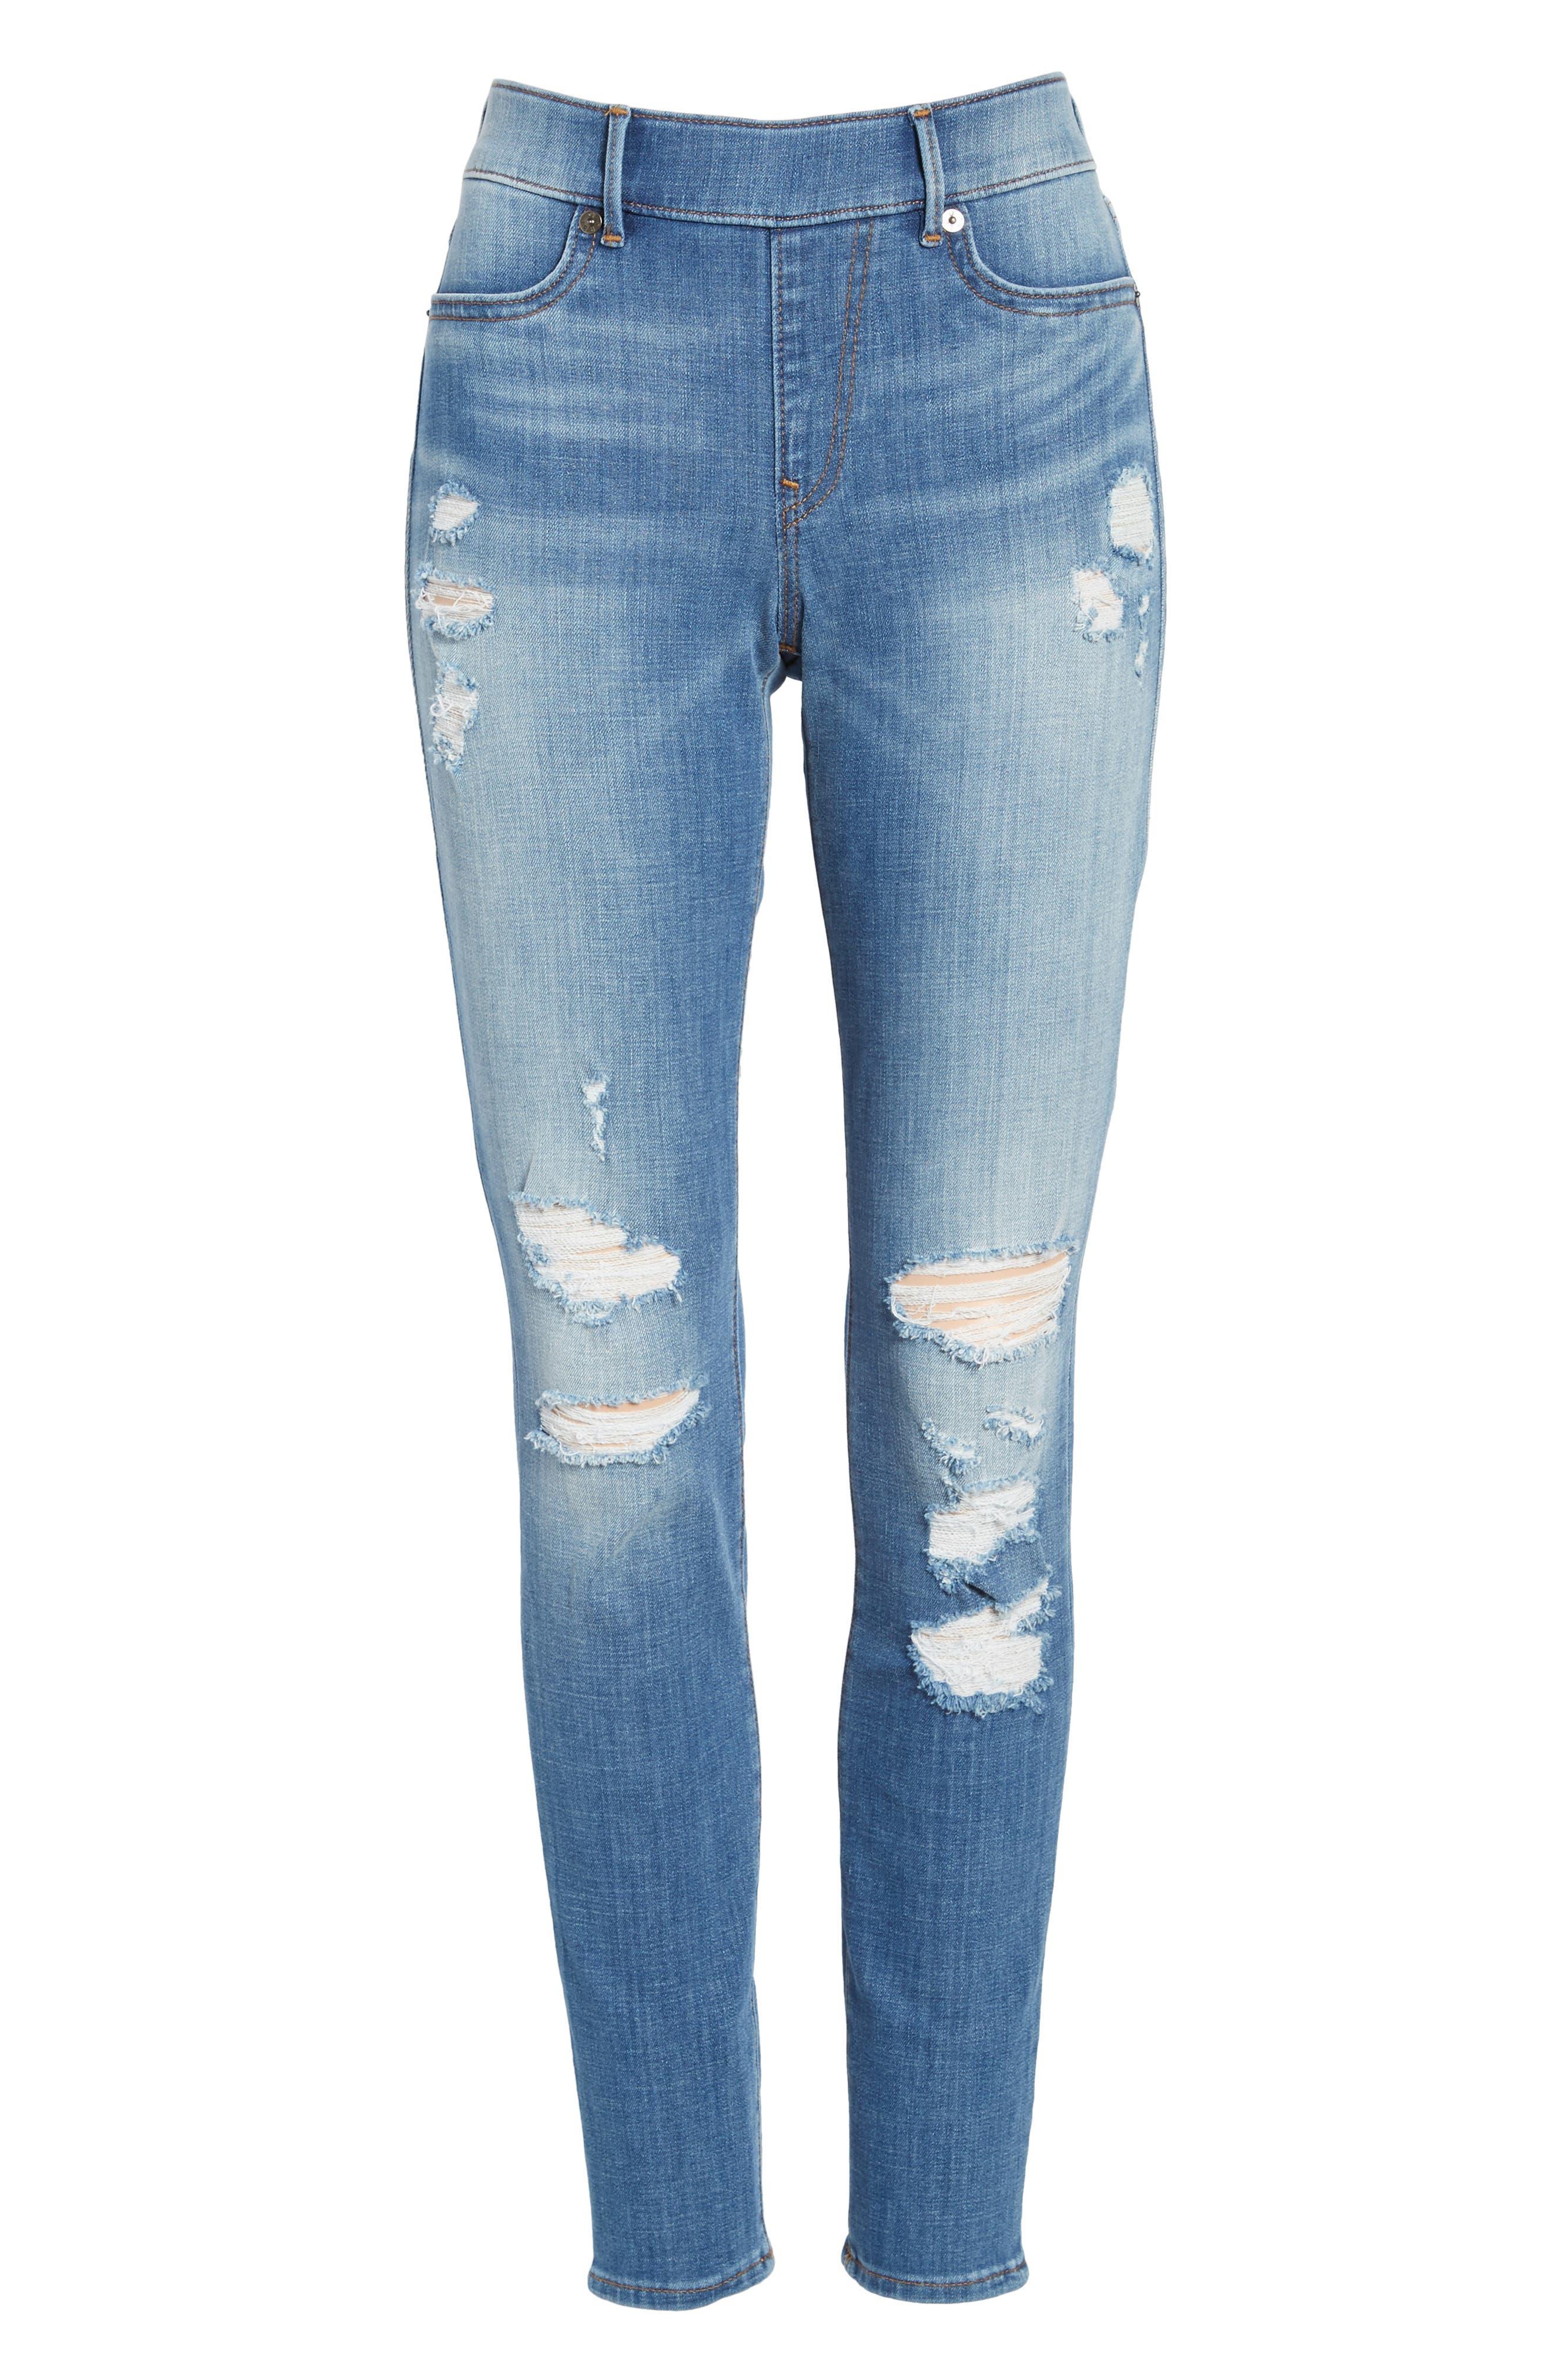 Jennie Runway Curvy Skinny Jeans,                             Alternate thumbnail 6, color,                             400